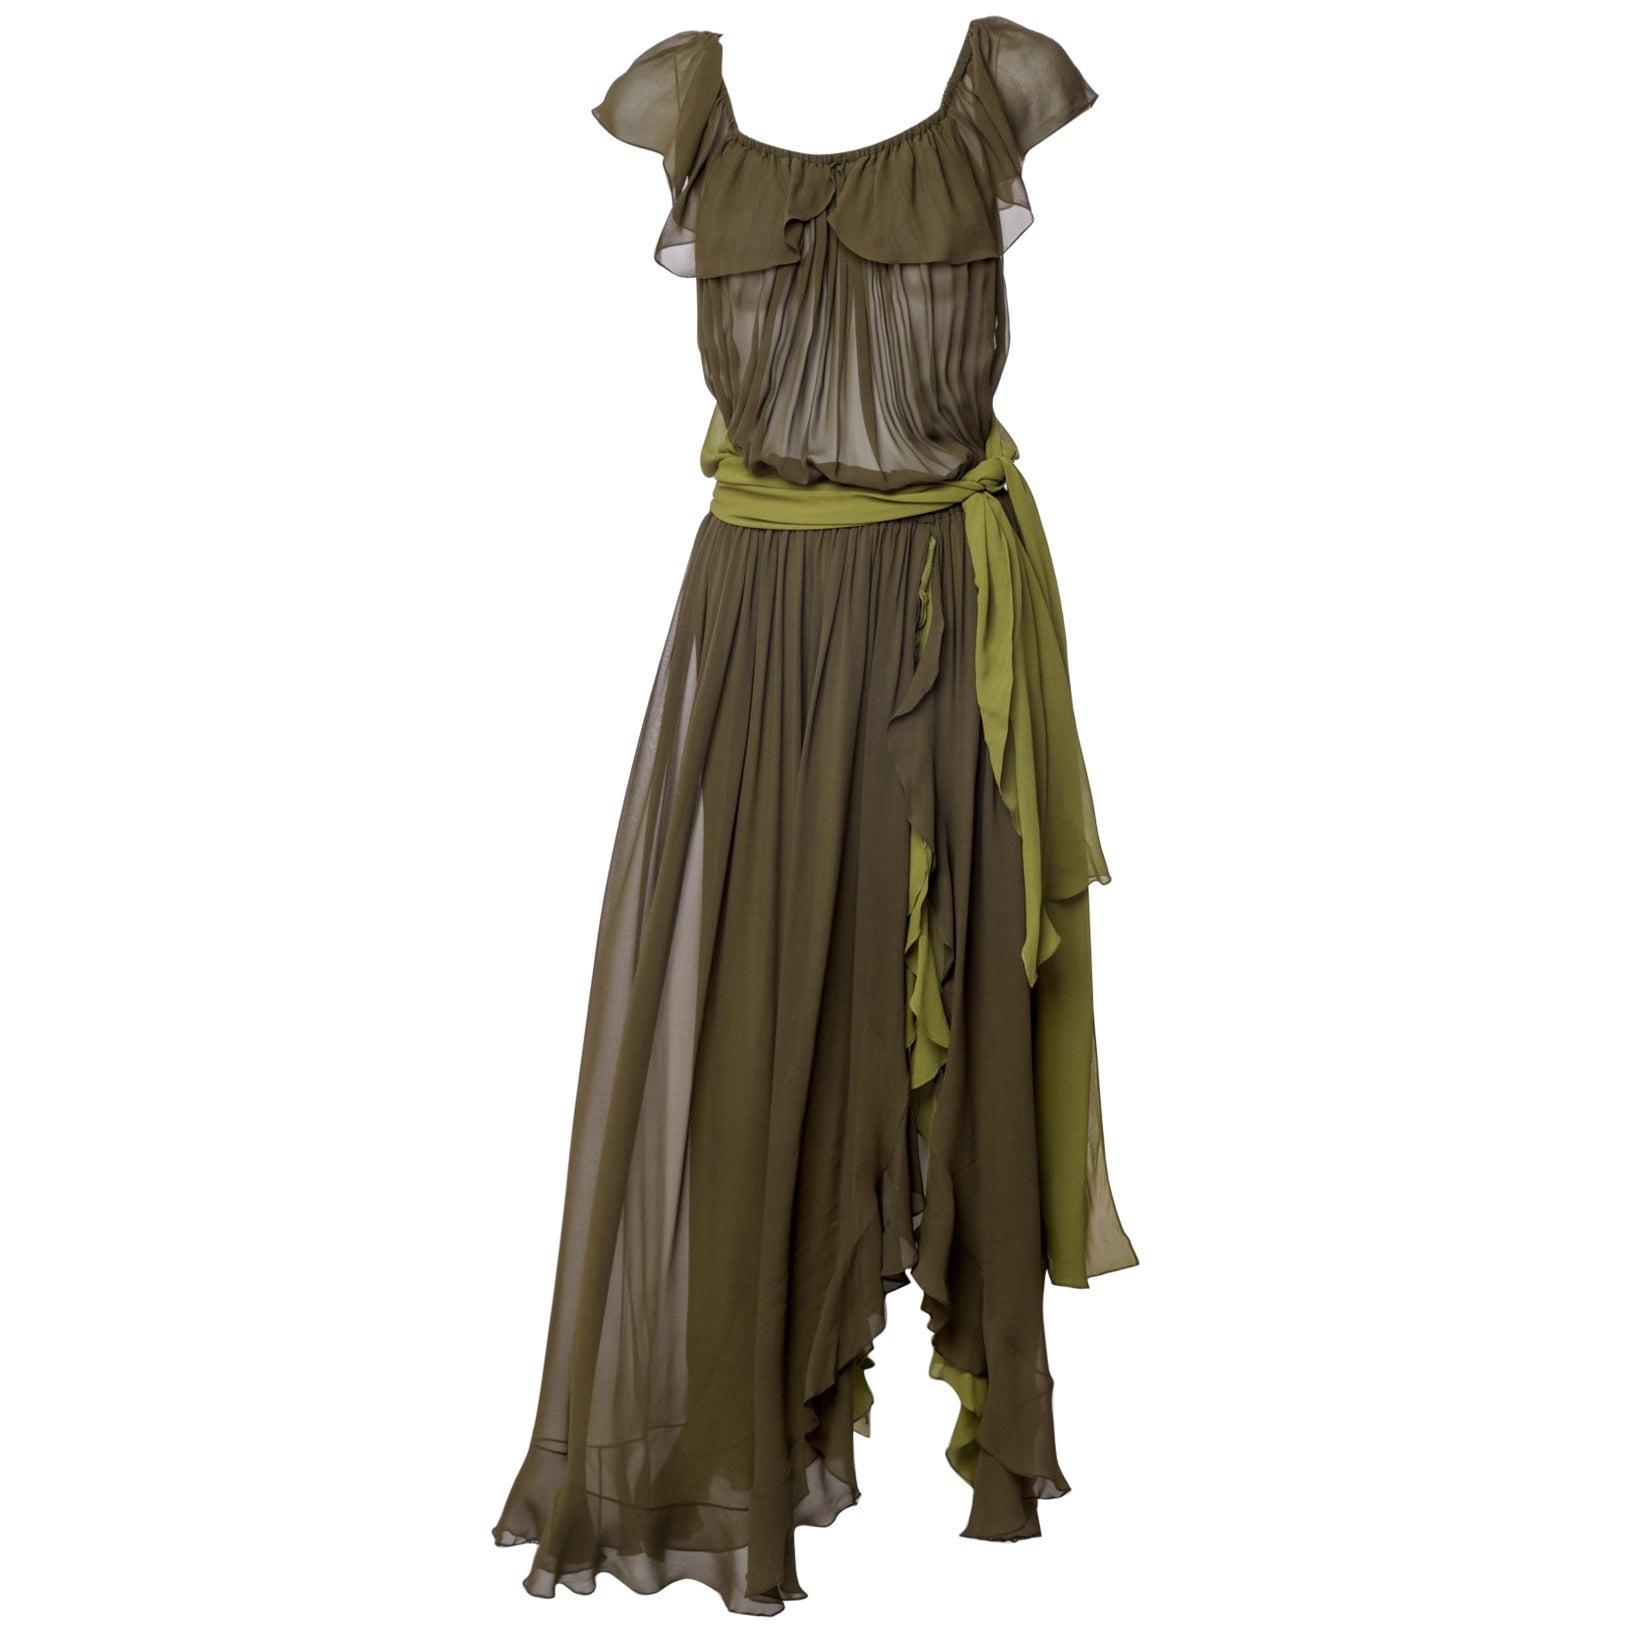 b6e9636c275 Vintage Yves Saint Laurent Green Silk Chiffon Ruffled Goddess Evening Gown  YSL For Sale at 1stdibs